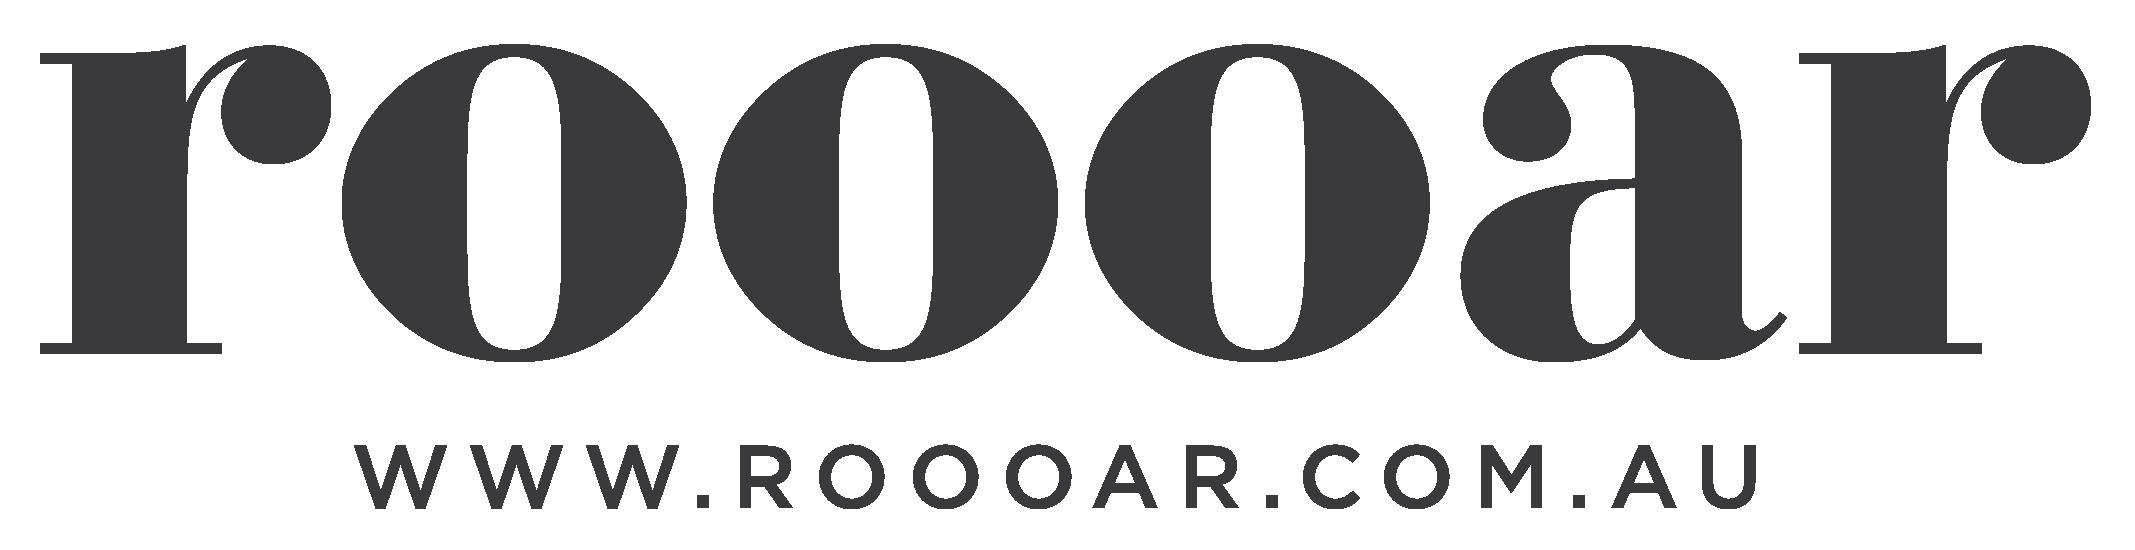 ROOOARLOGO-01 (1)